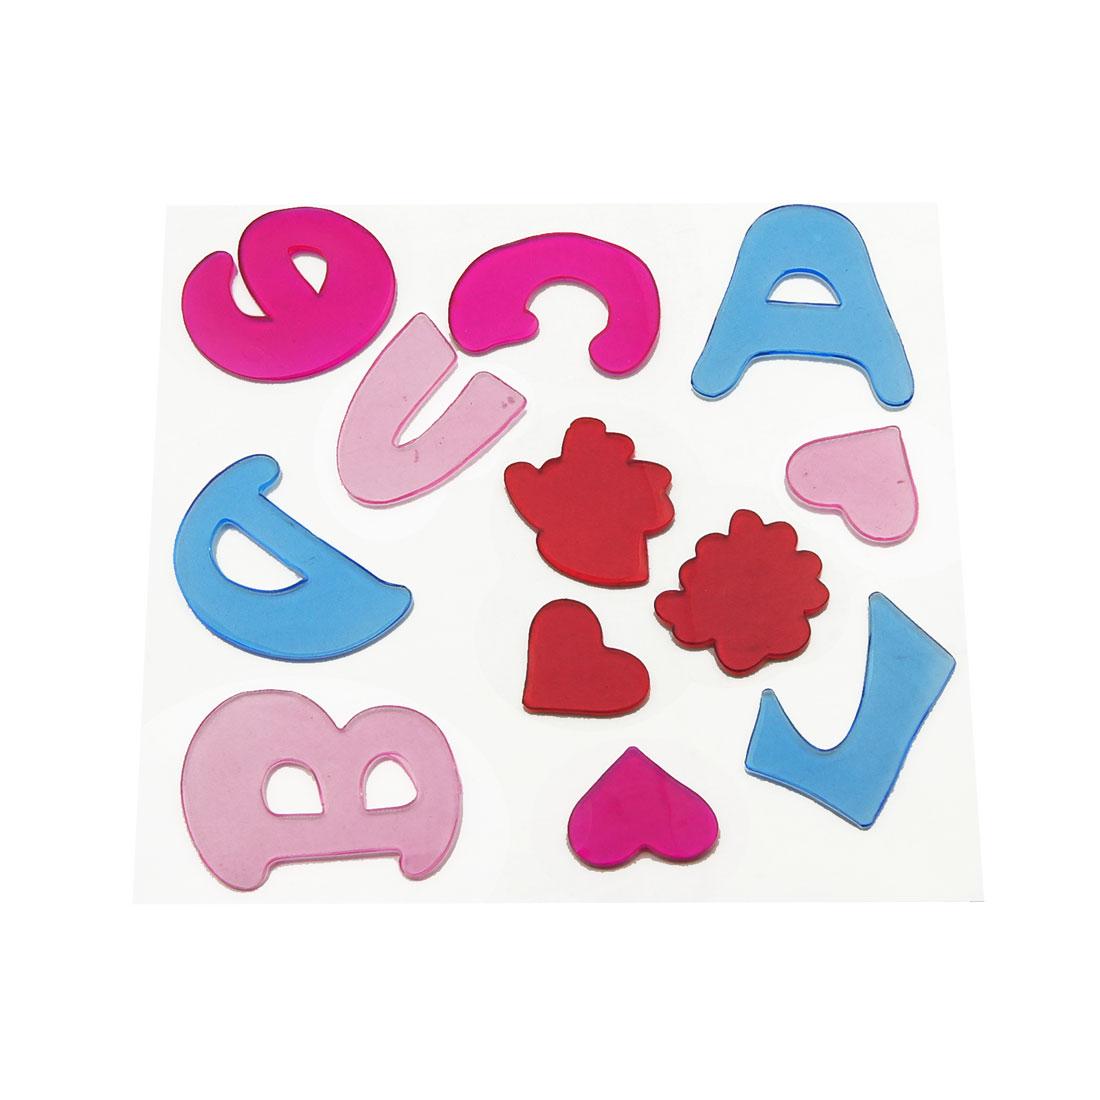 Glass Doors Decor Heart Letter Shaped Colloid Paste Gel Sticker 12 Pcs